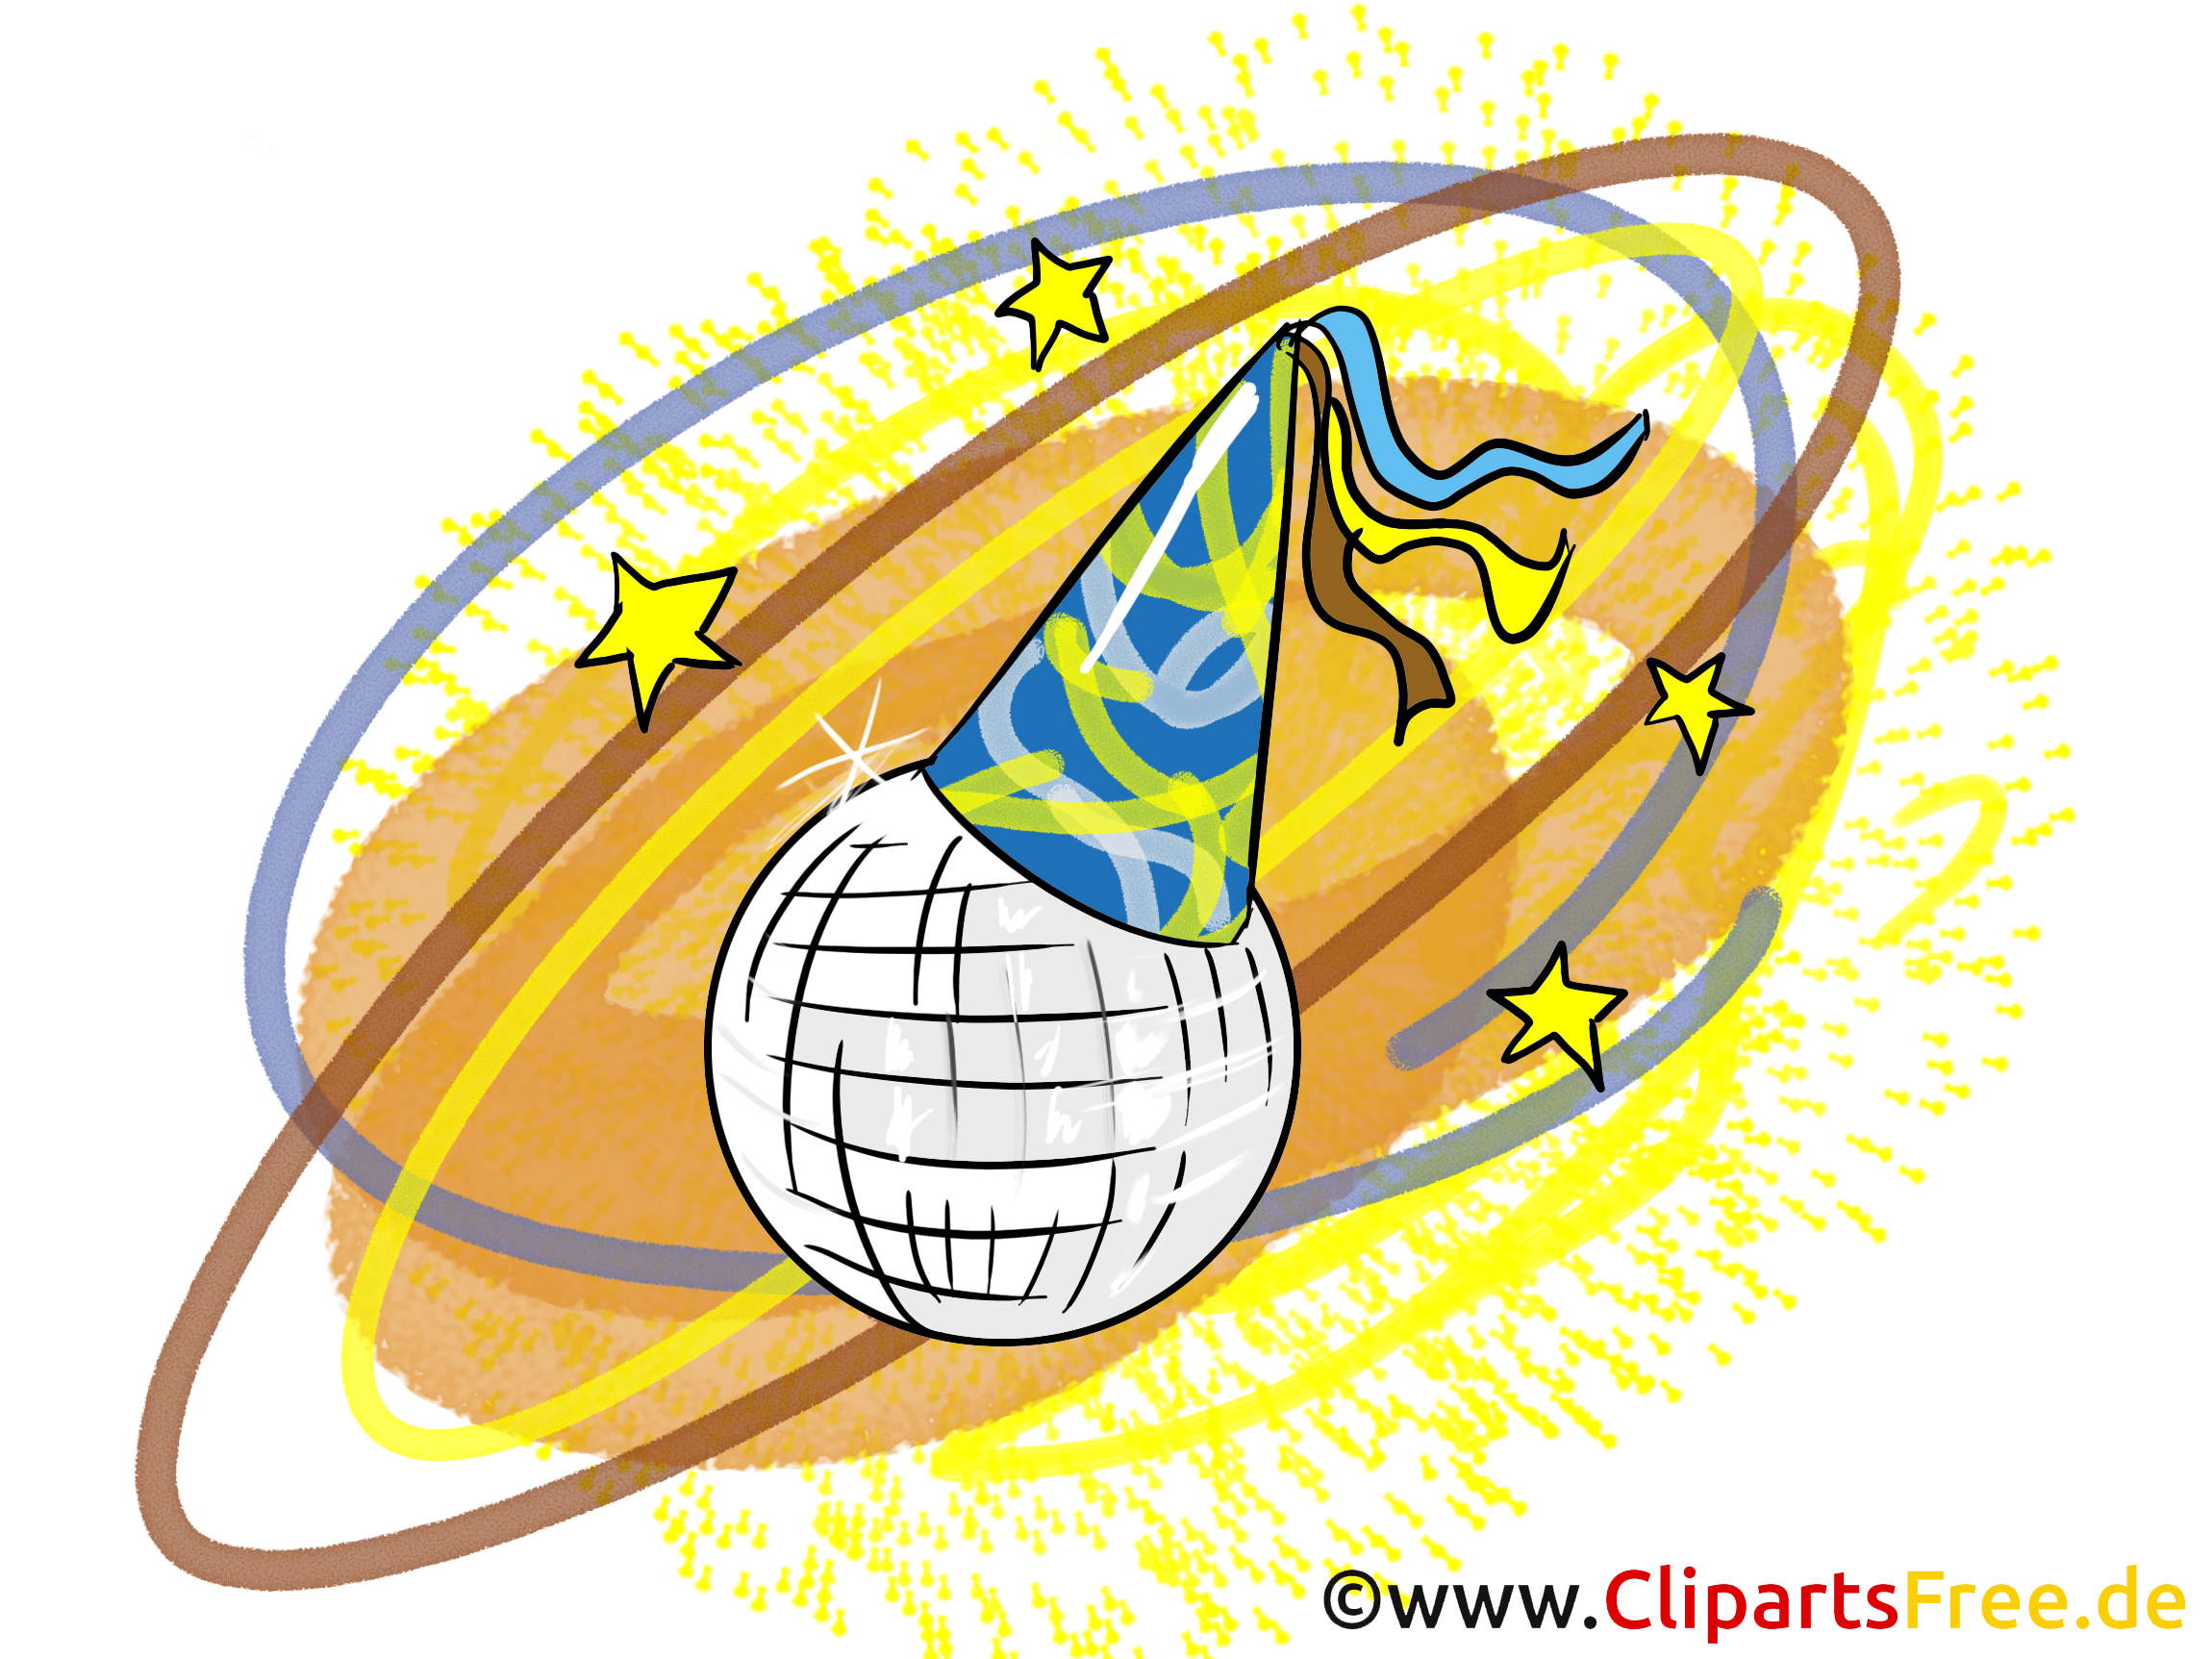 Spiegelkugel Clipart, Bild, Grafik, Illustration